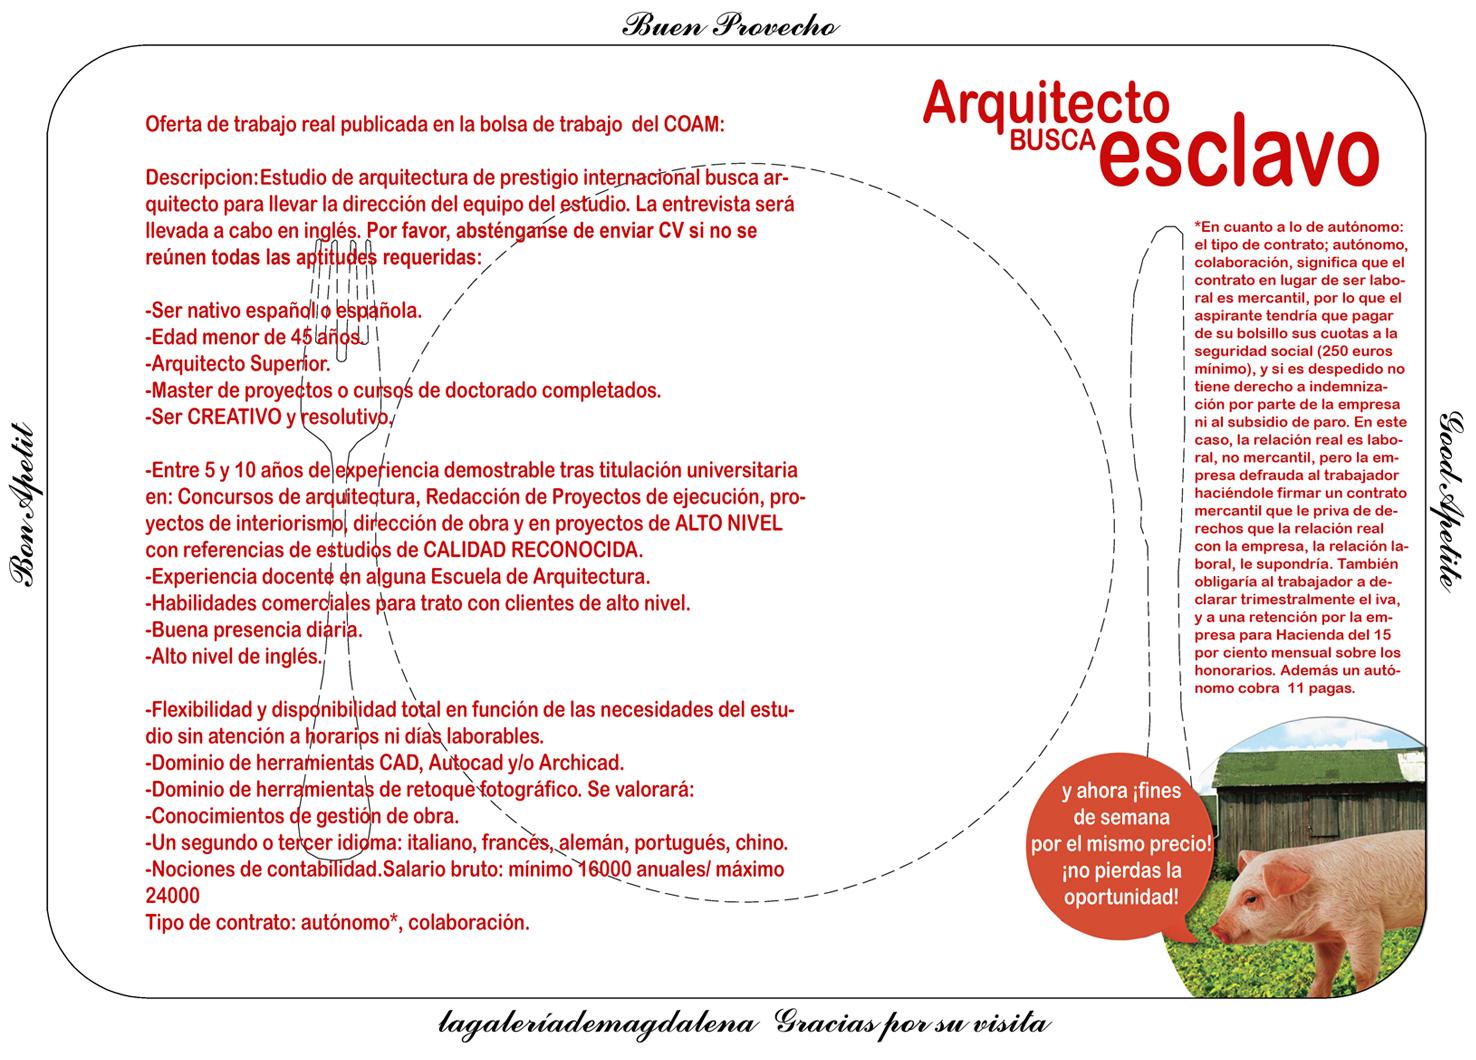 Granada ii arquitecto busca esclavo lagaleriademagdalena - Colegio arquitectos granada ...